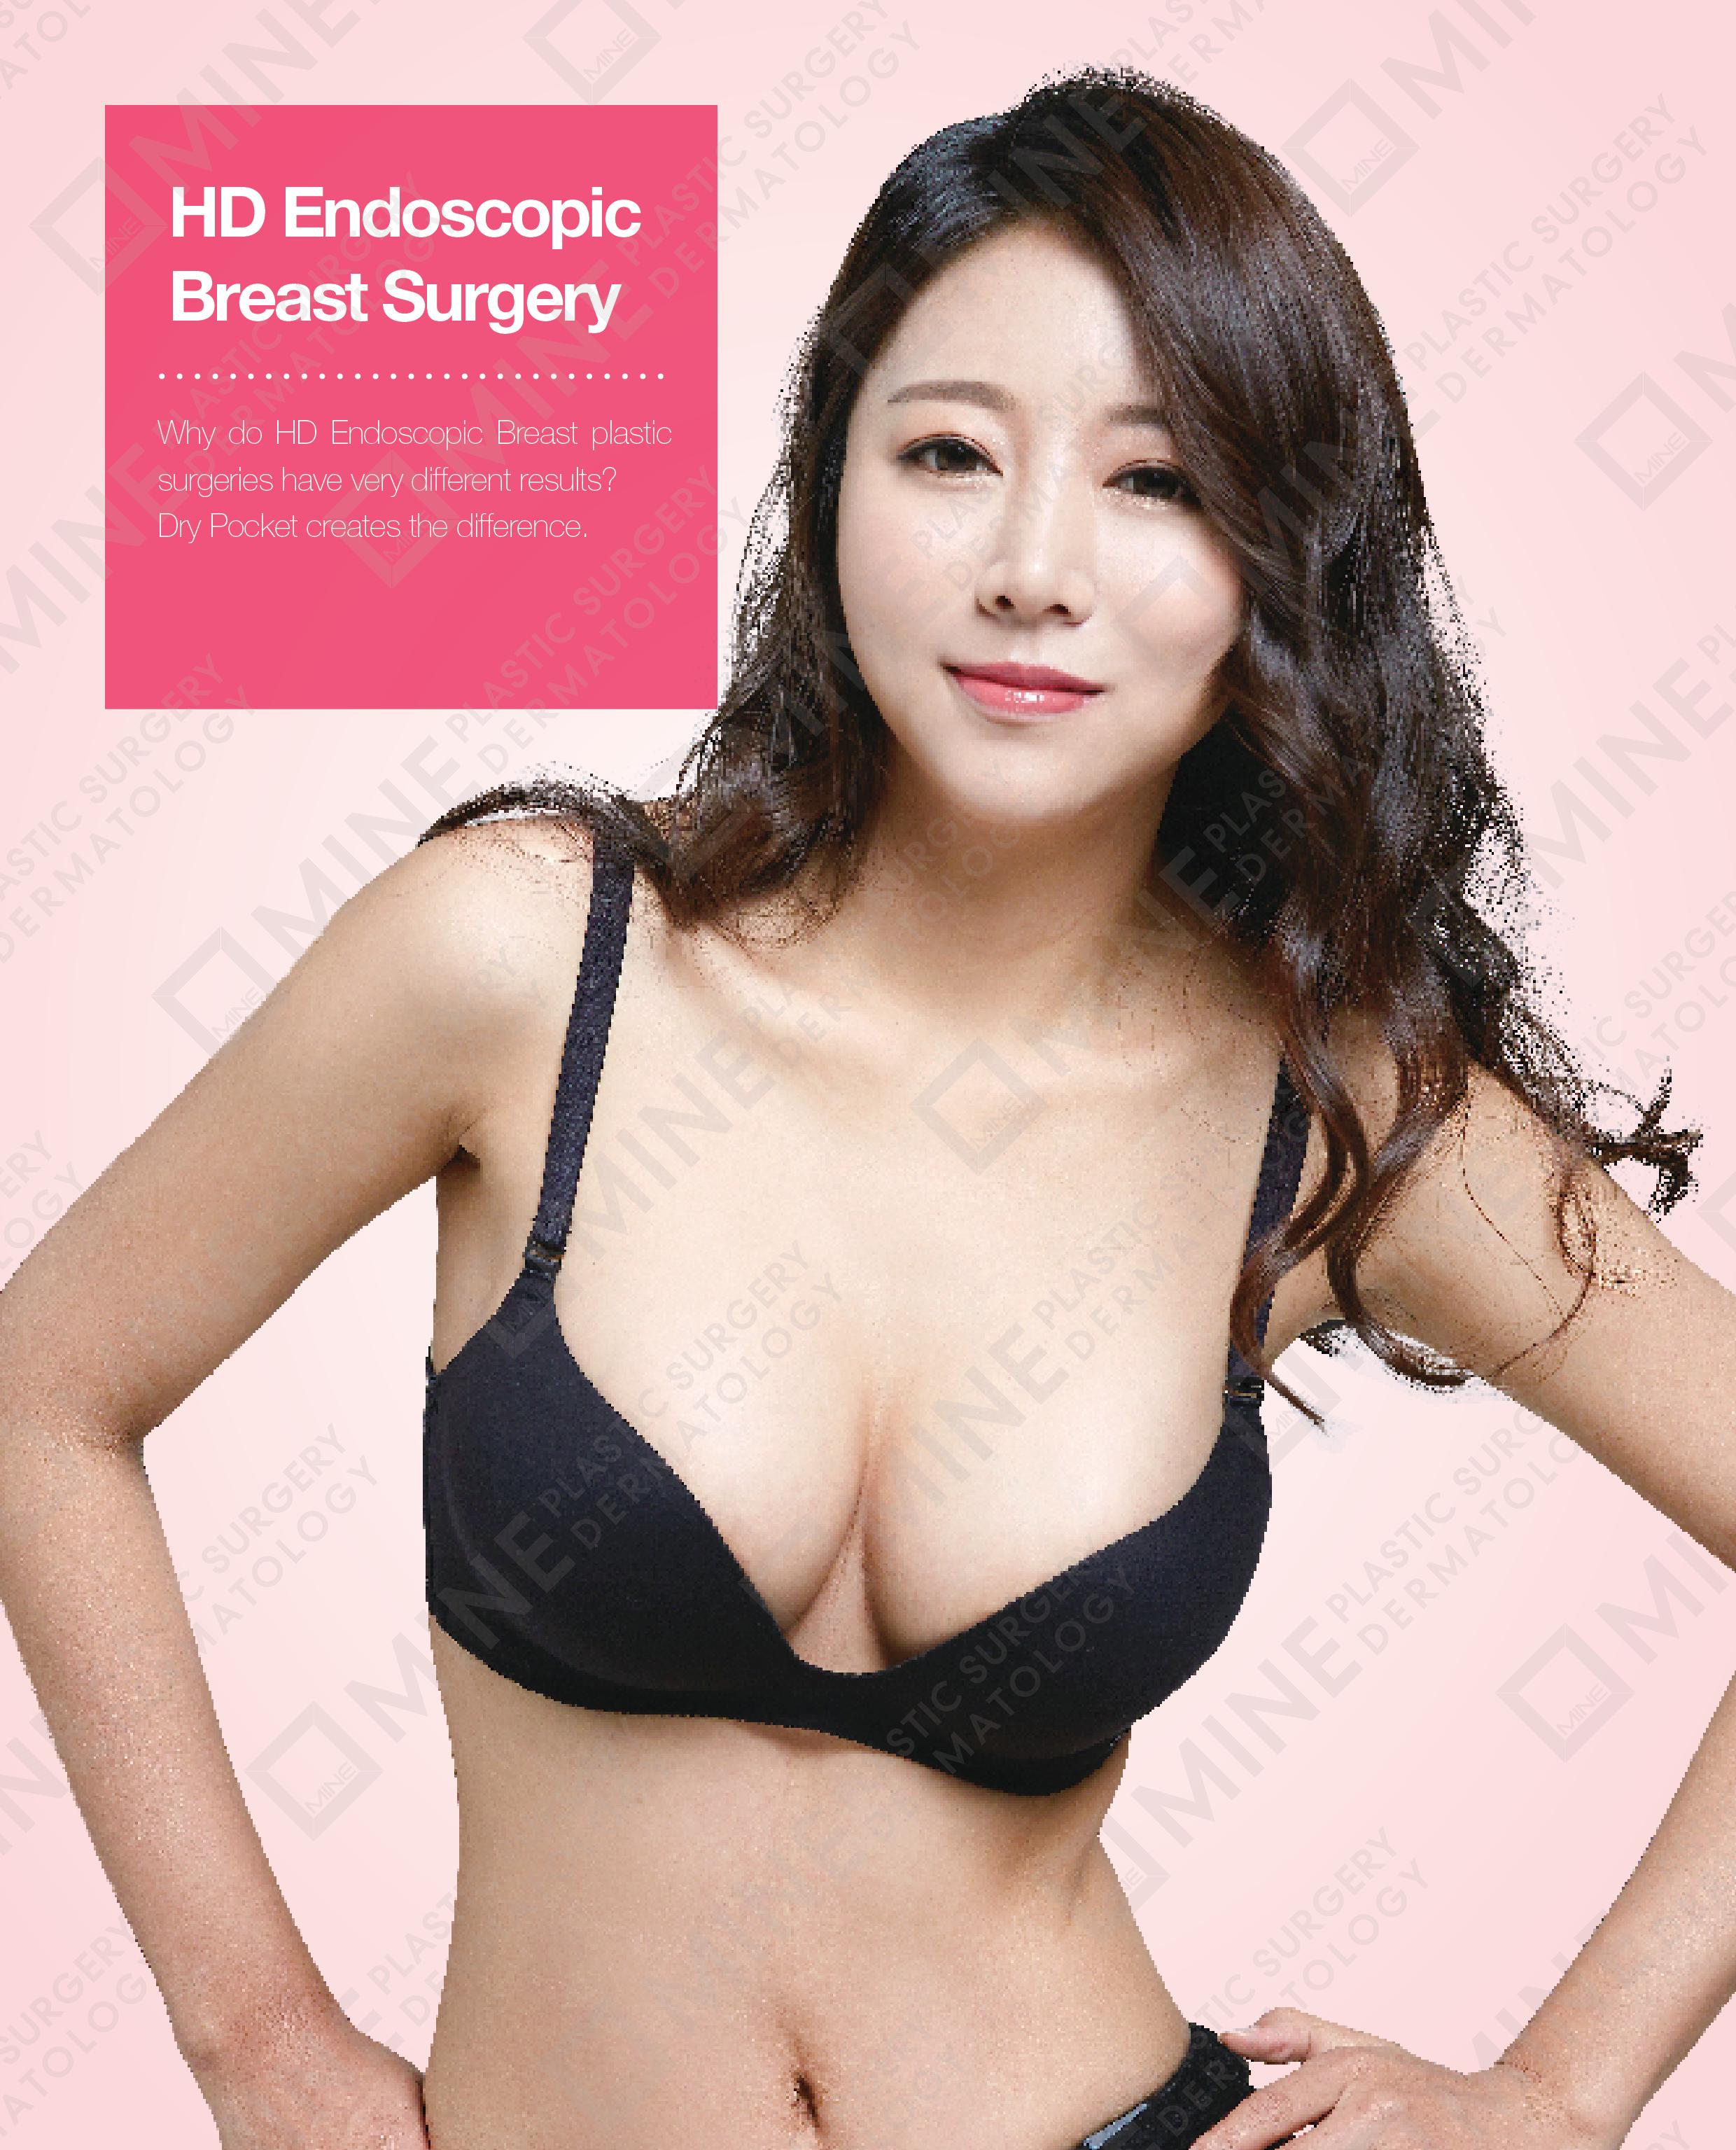 brest surgery